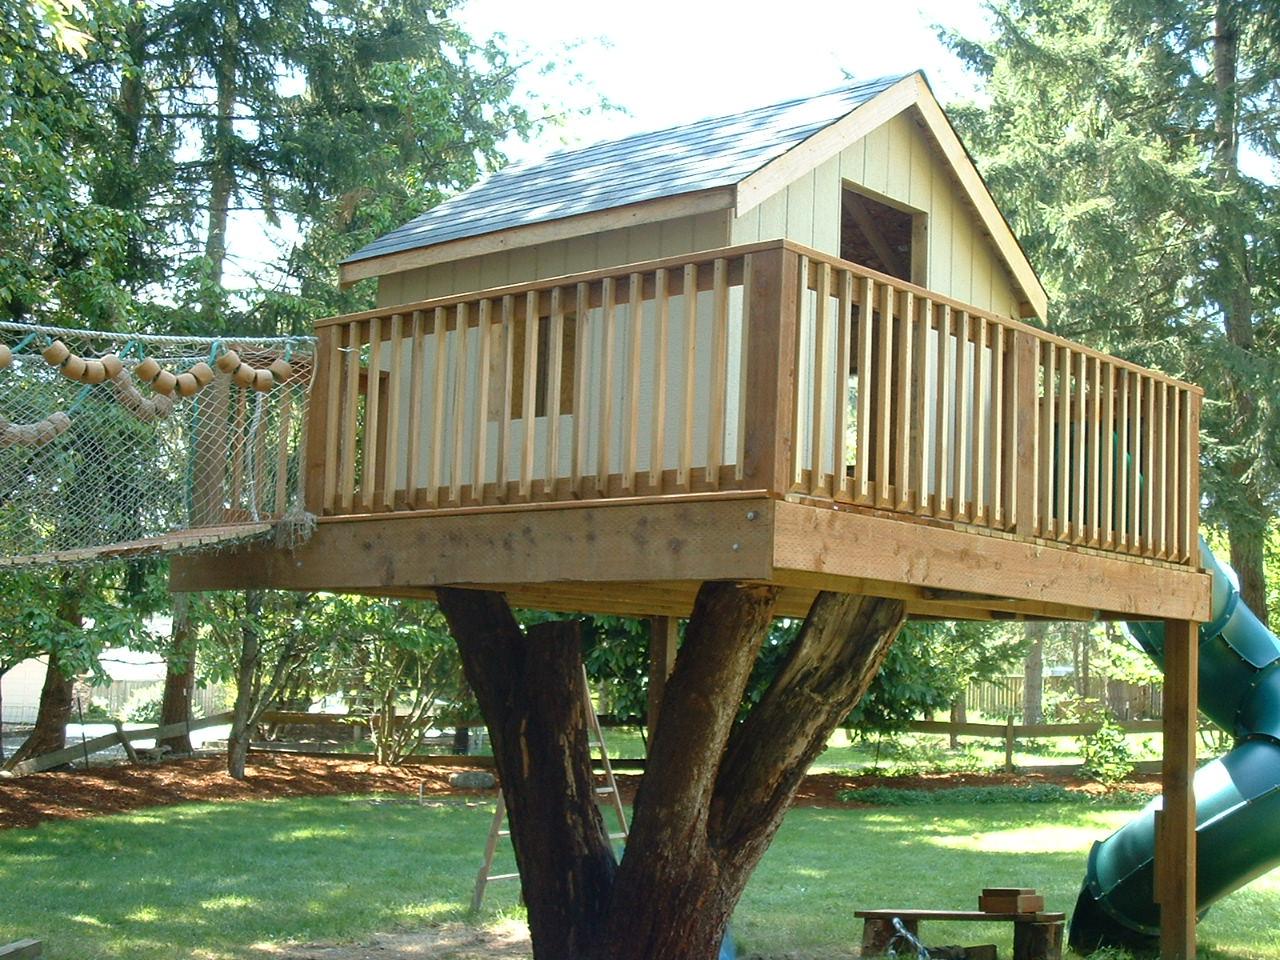 modren tree house blueprints for kids plans free additinoal tree house blueprints for kids